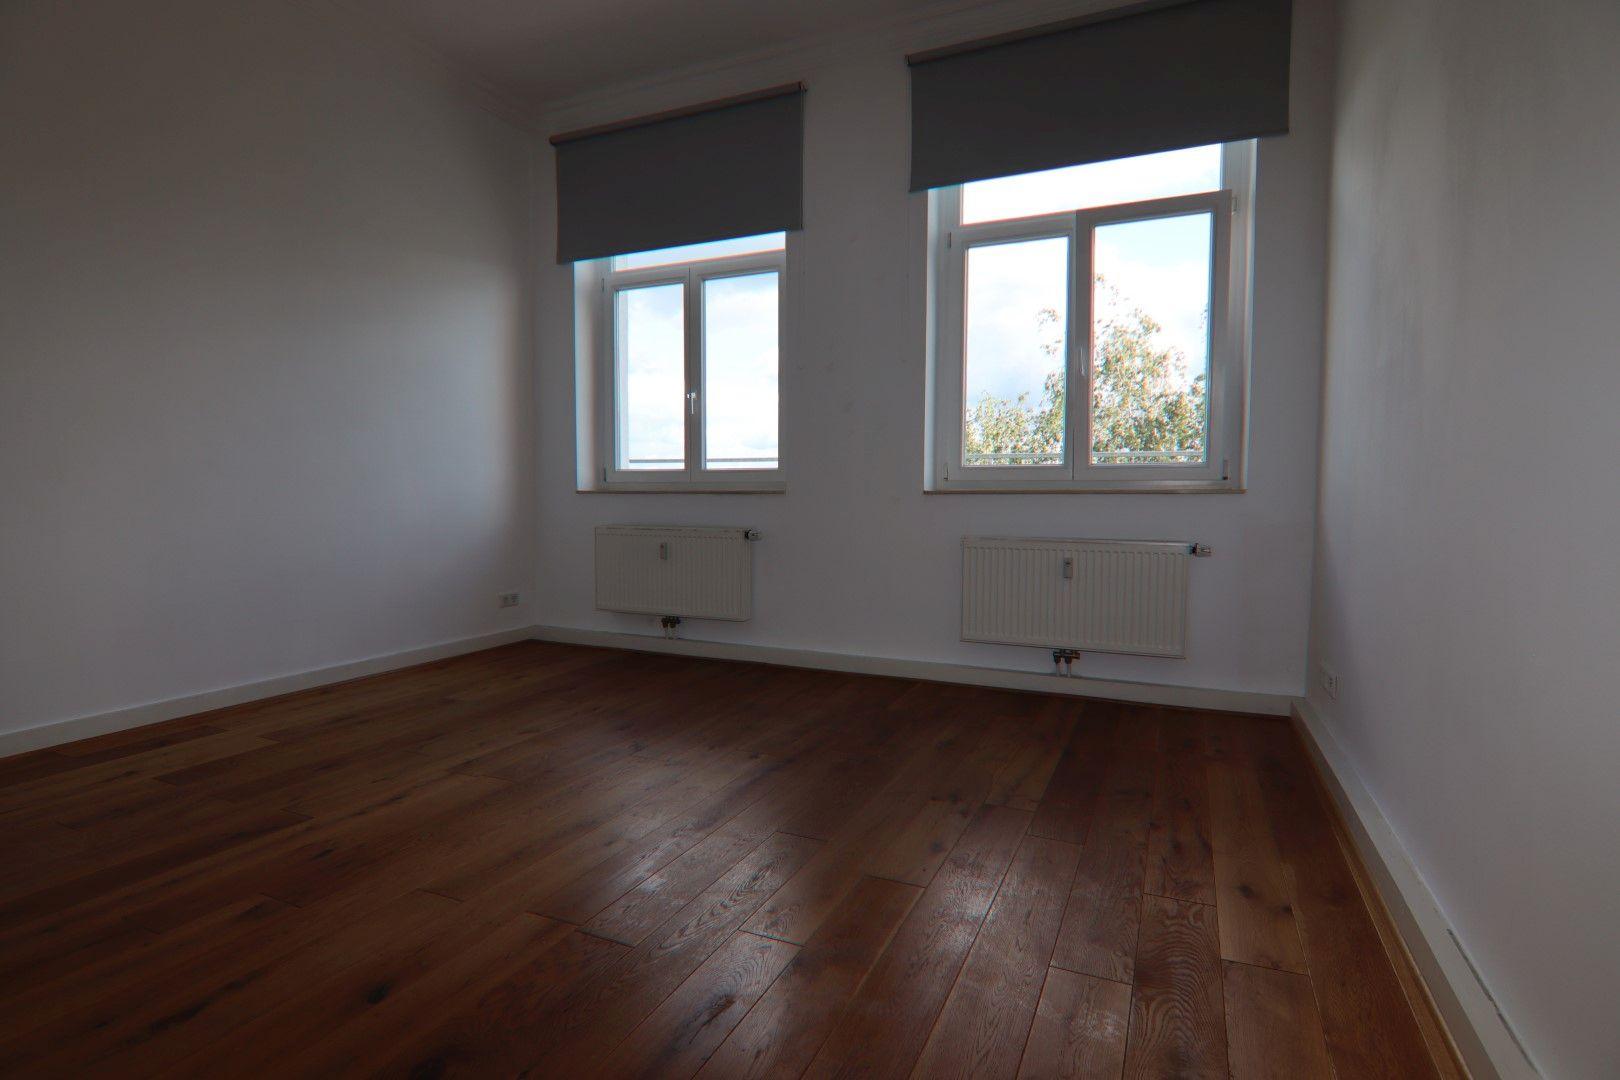 Immobilie Nr.0271 - 3-Zimmer-Altbauwohnung mit Aufzug im 3.OG - Bild 3.jpg